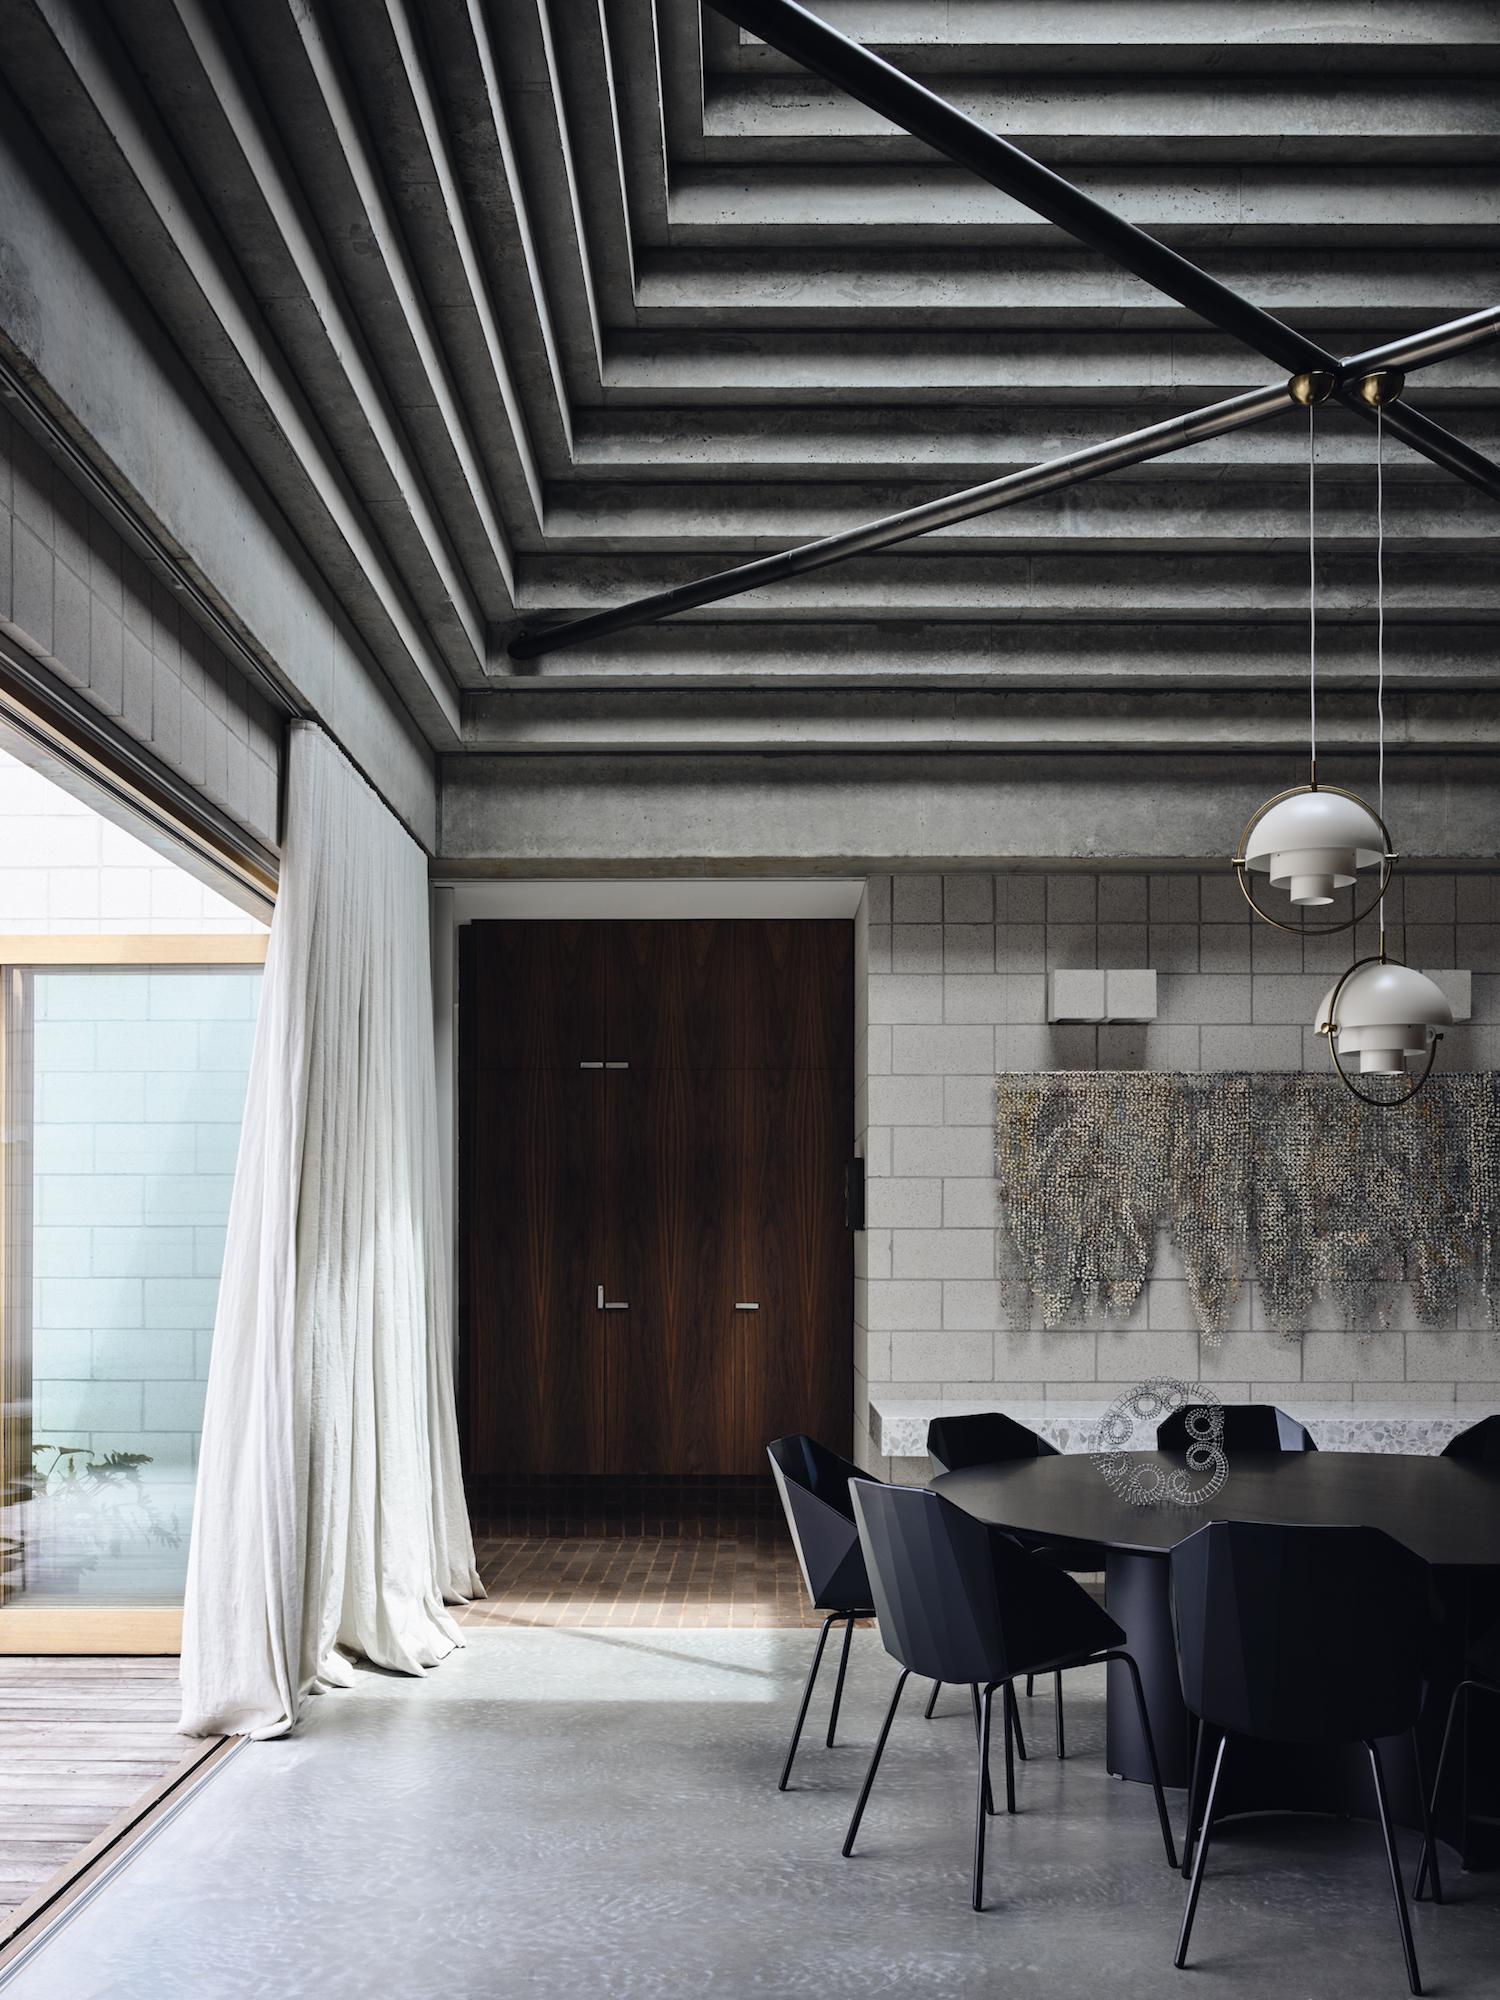 est living bellows house architects EAT 14